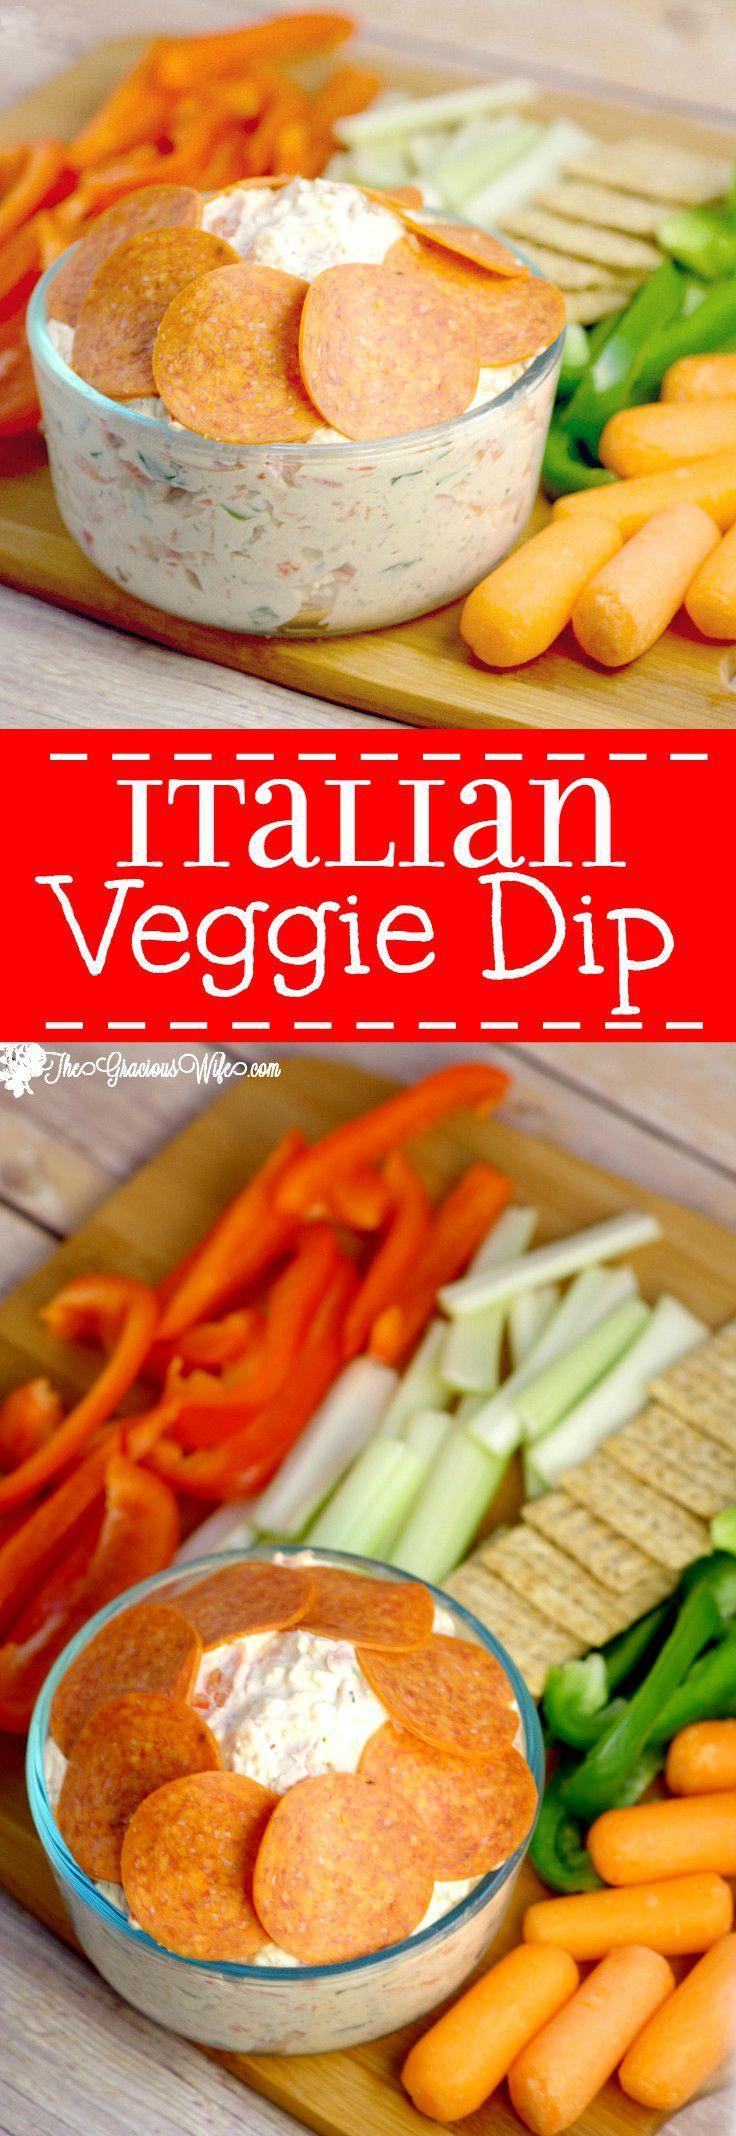 Italian Veggie Dip Cold Dip Recipes Veggie Dip Veggie Dip Recipe